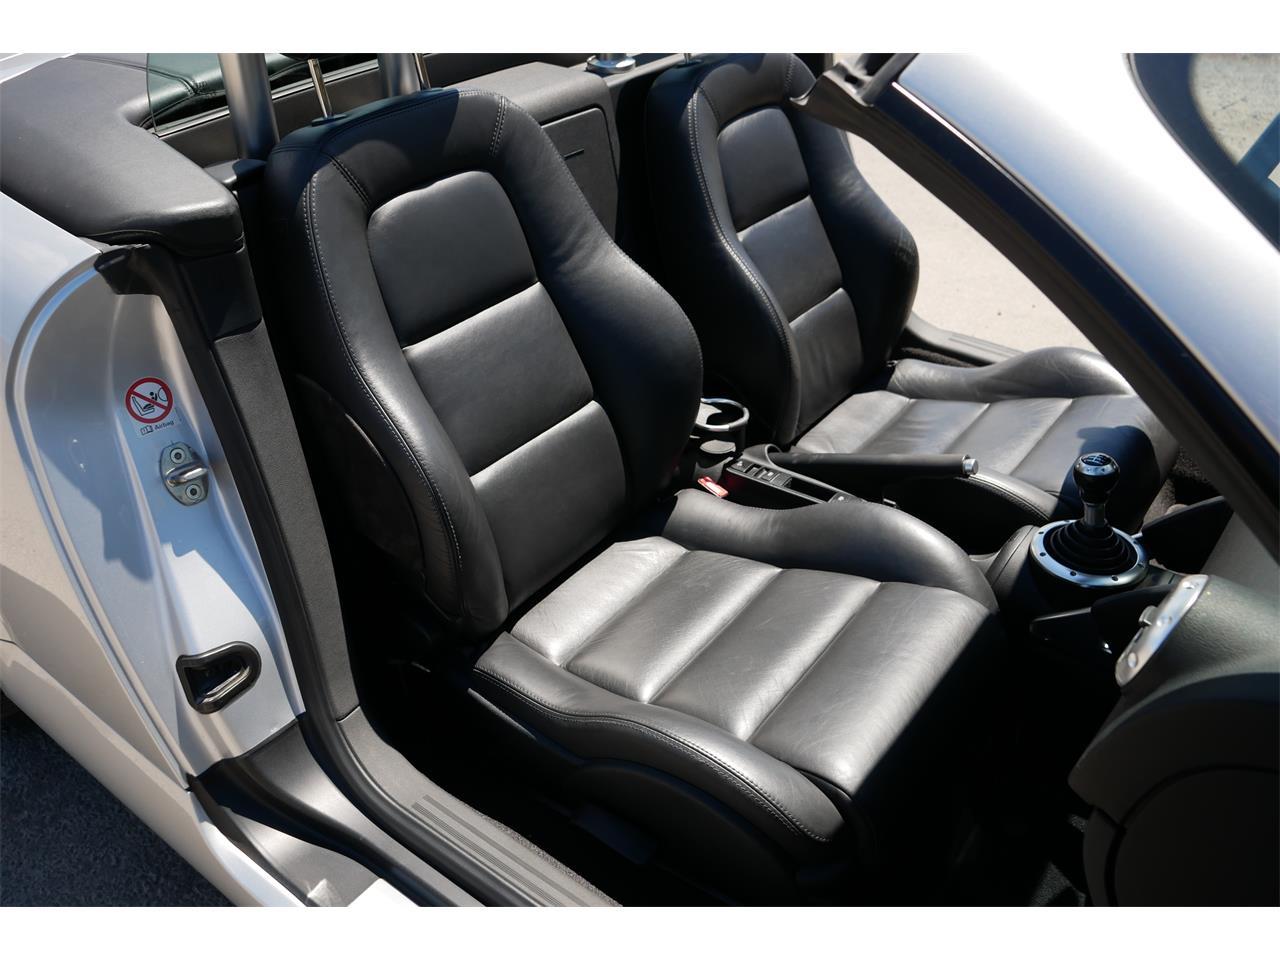 2001 Audi TT (CC-1365039) for sale in Reno, Nevada